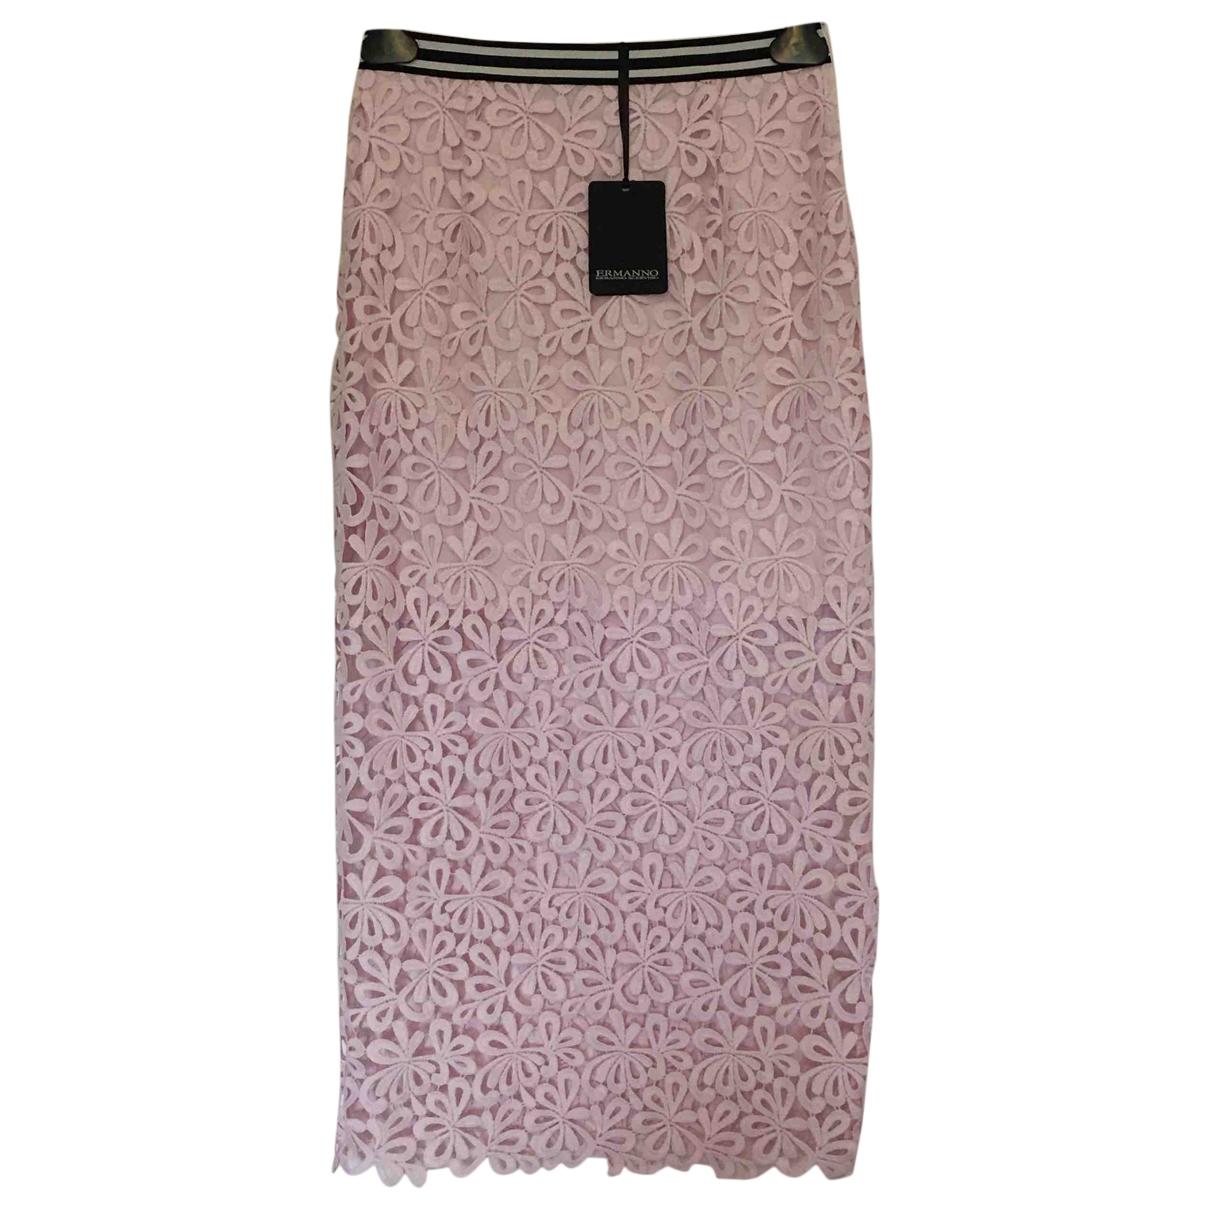 Ermanno Scervino \N Pink Cotton skirt for Women 40 FR